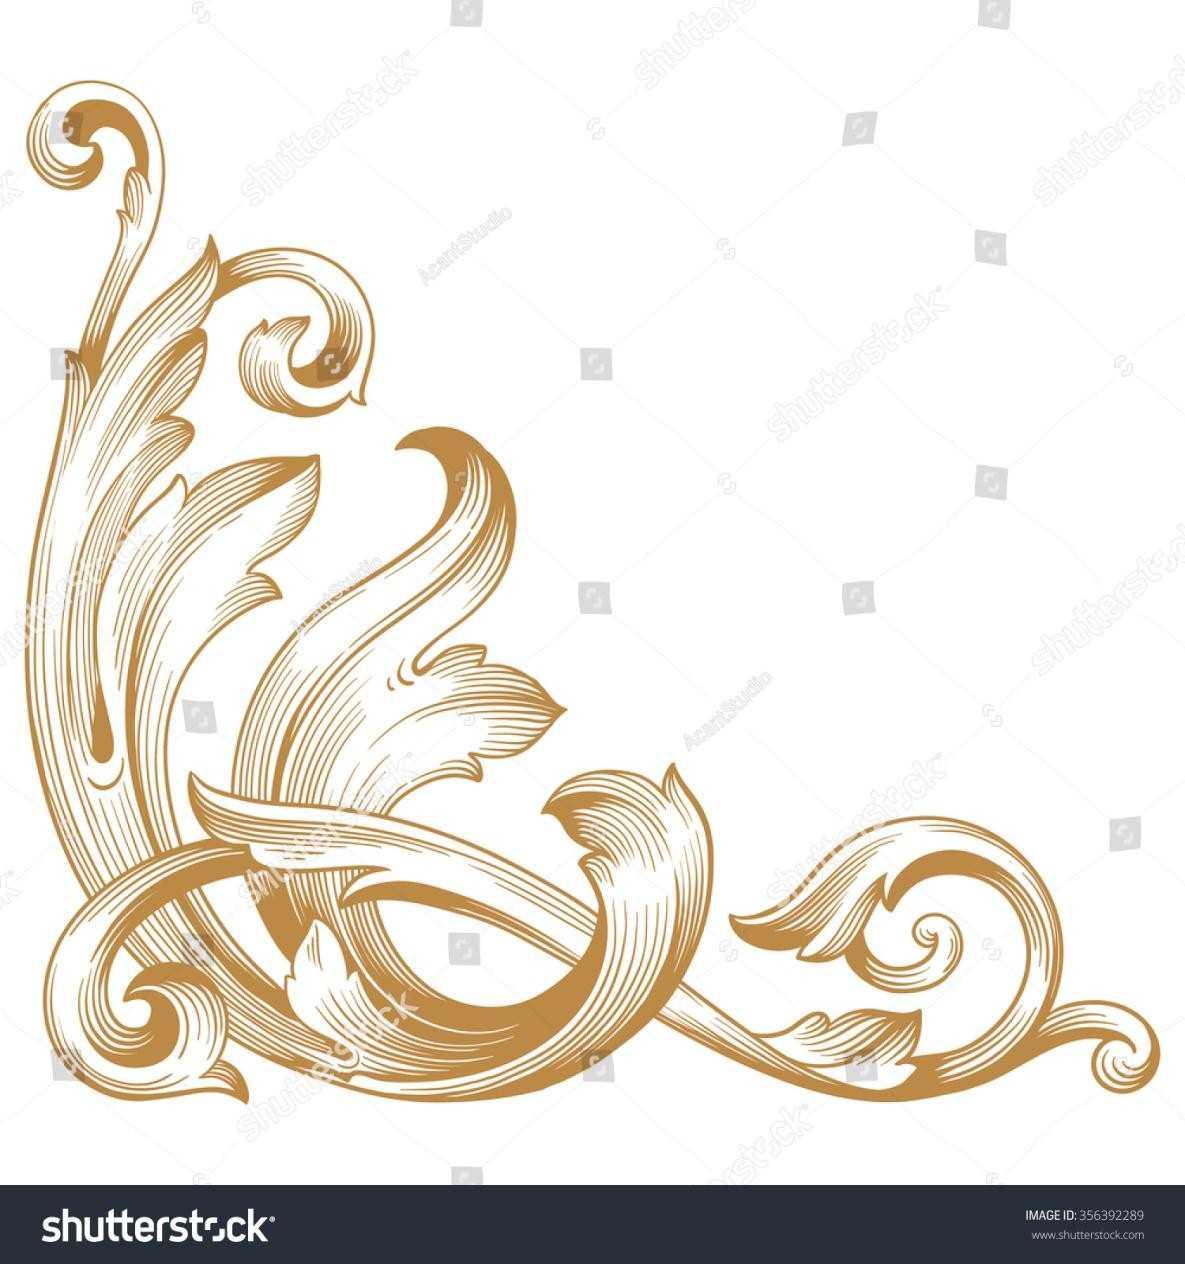 1185x1264 Photo Vector Rhshutterstockcom Golden Mandala Ornament Decorative